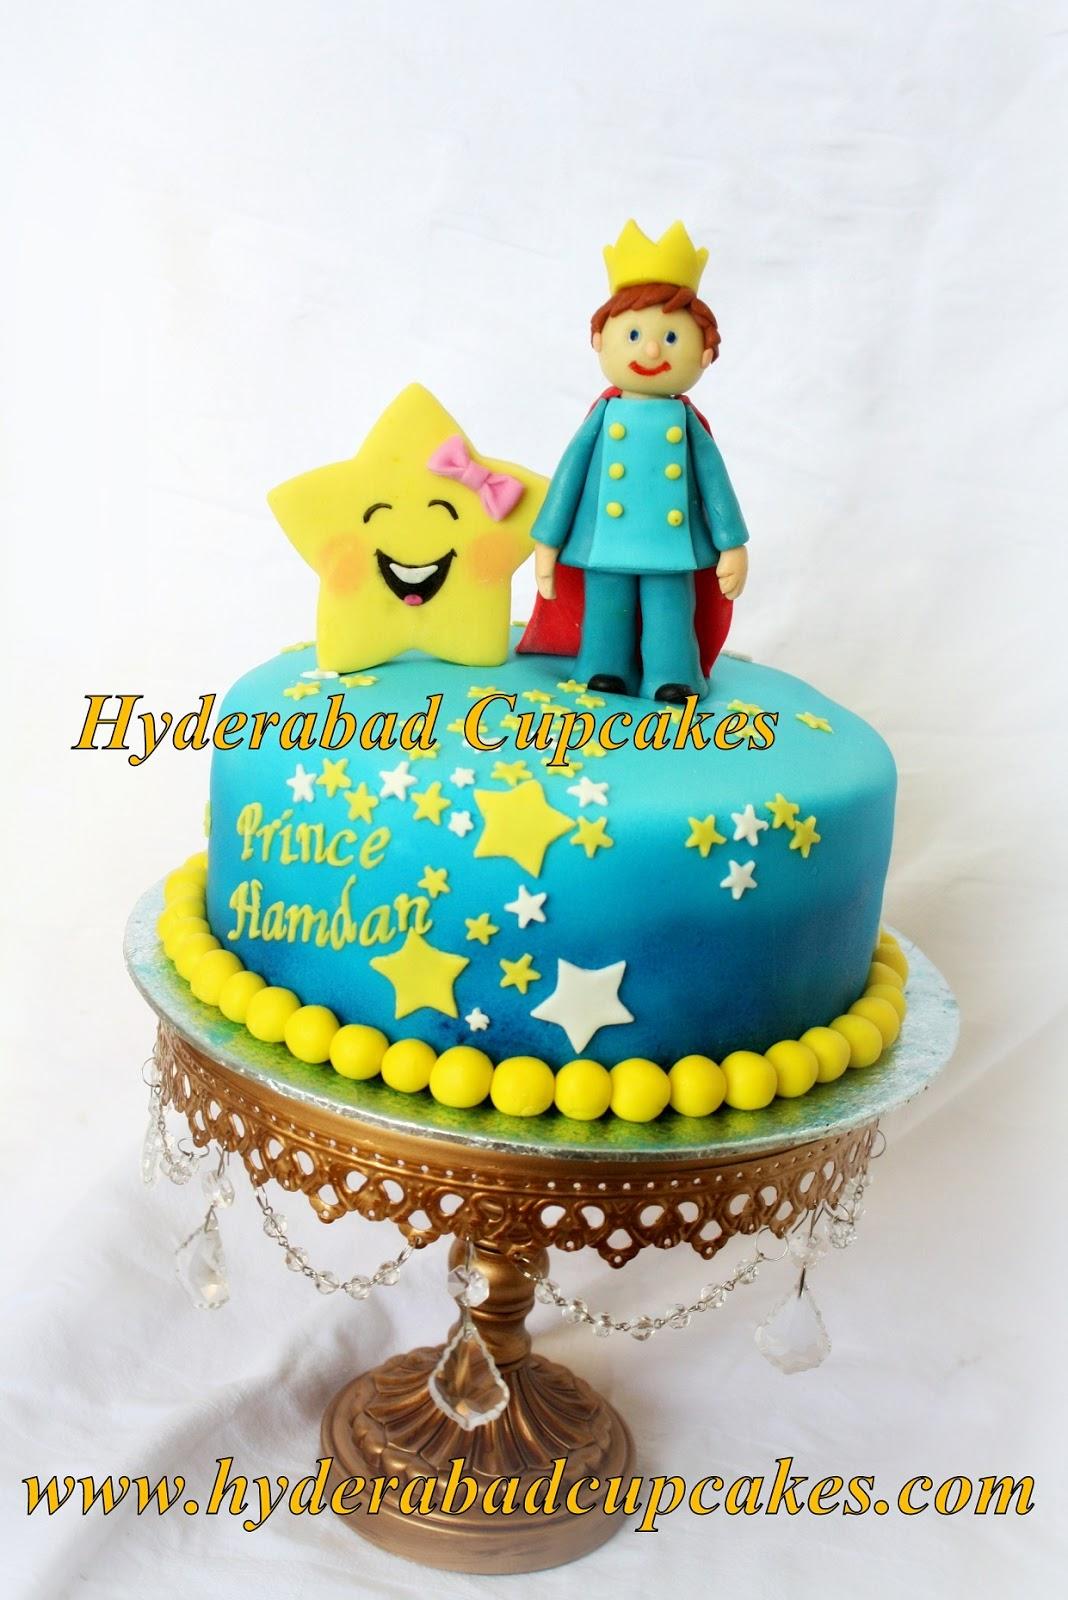 custom birthday cakes hyderabad 1 on custom birthday cakes hyderabad